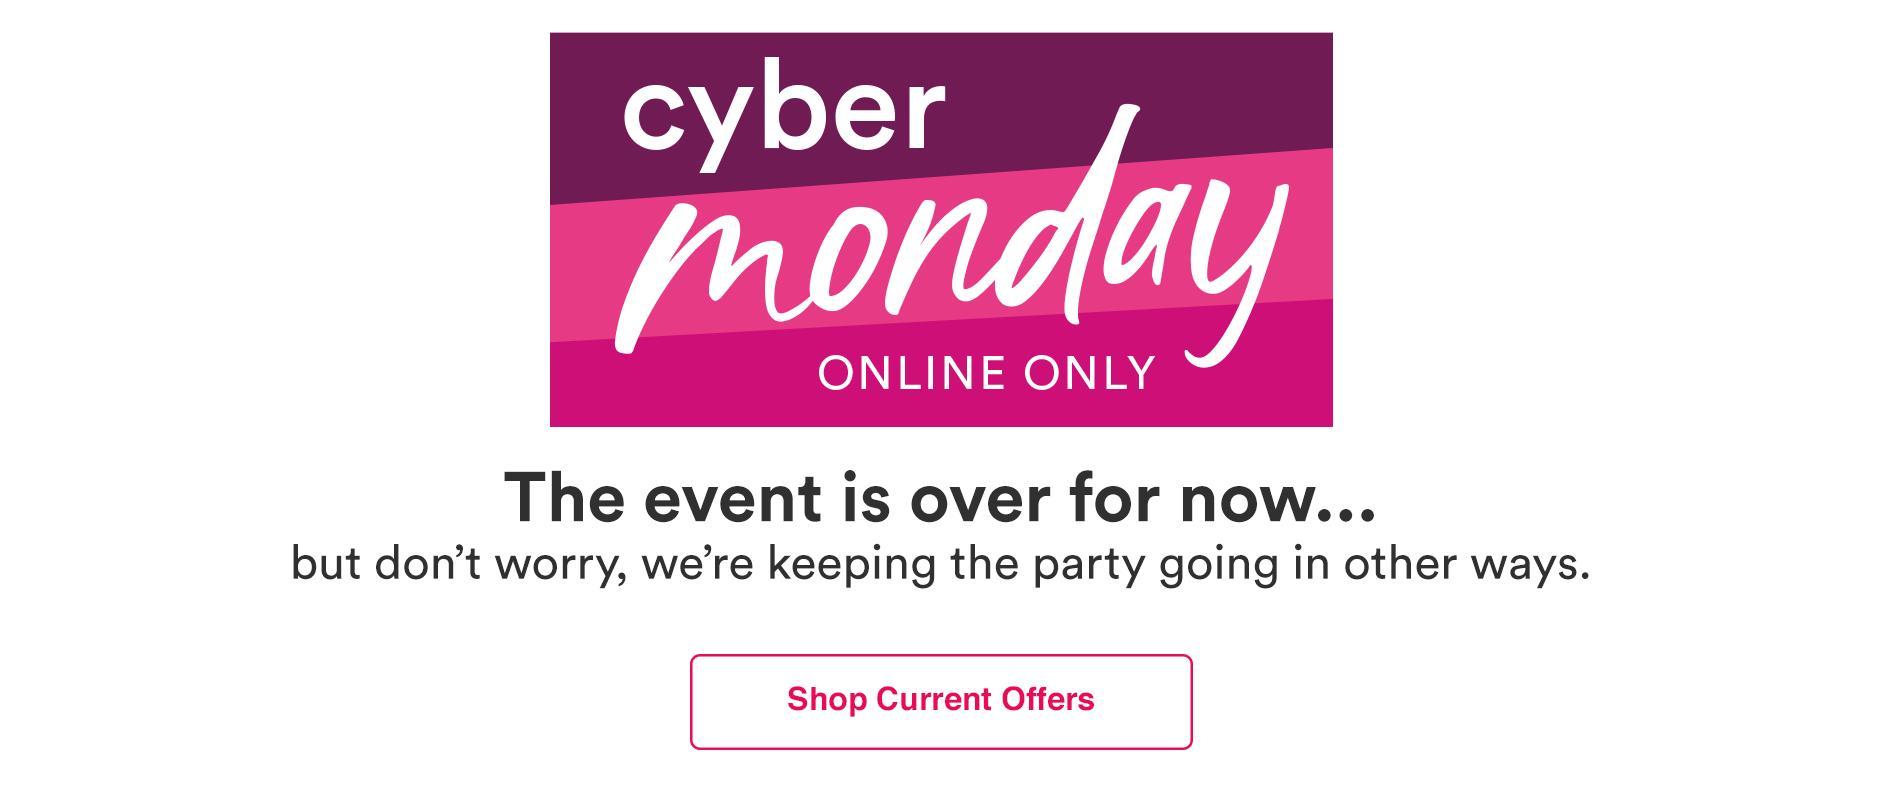 Cyber Monday Sale Ulta Beauty